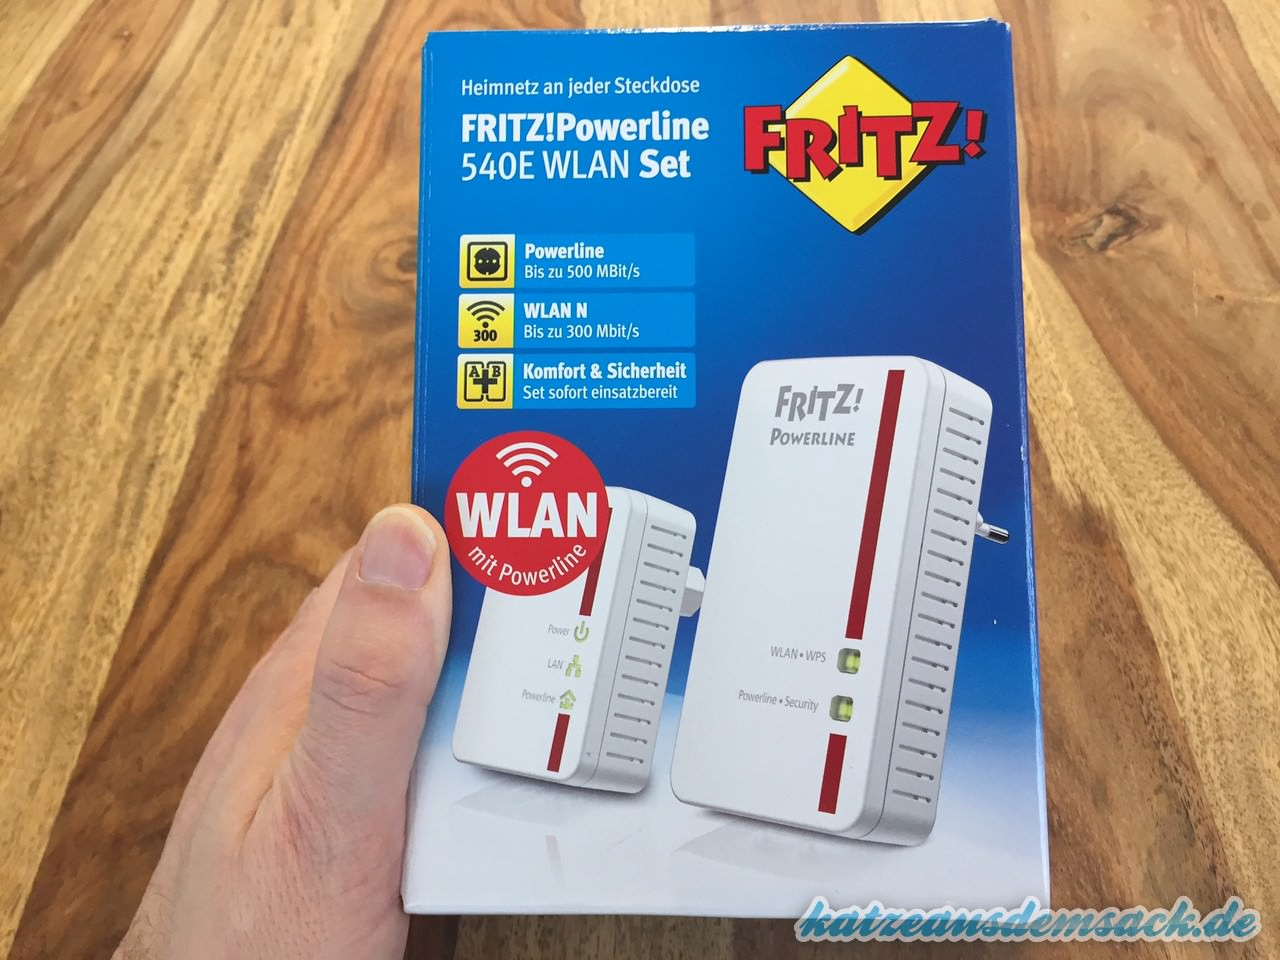 fritz-powerline-set-510-540e-netzwerk-stromleitung-steckdose